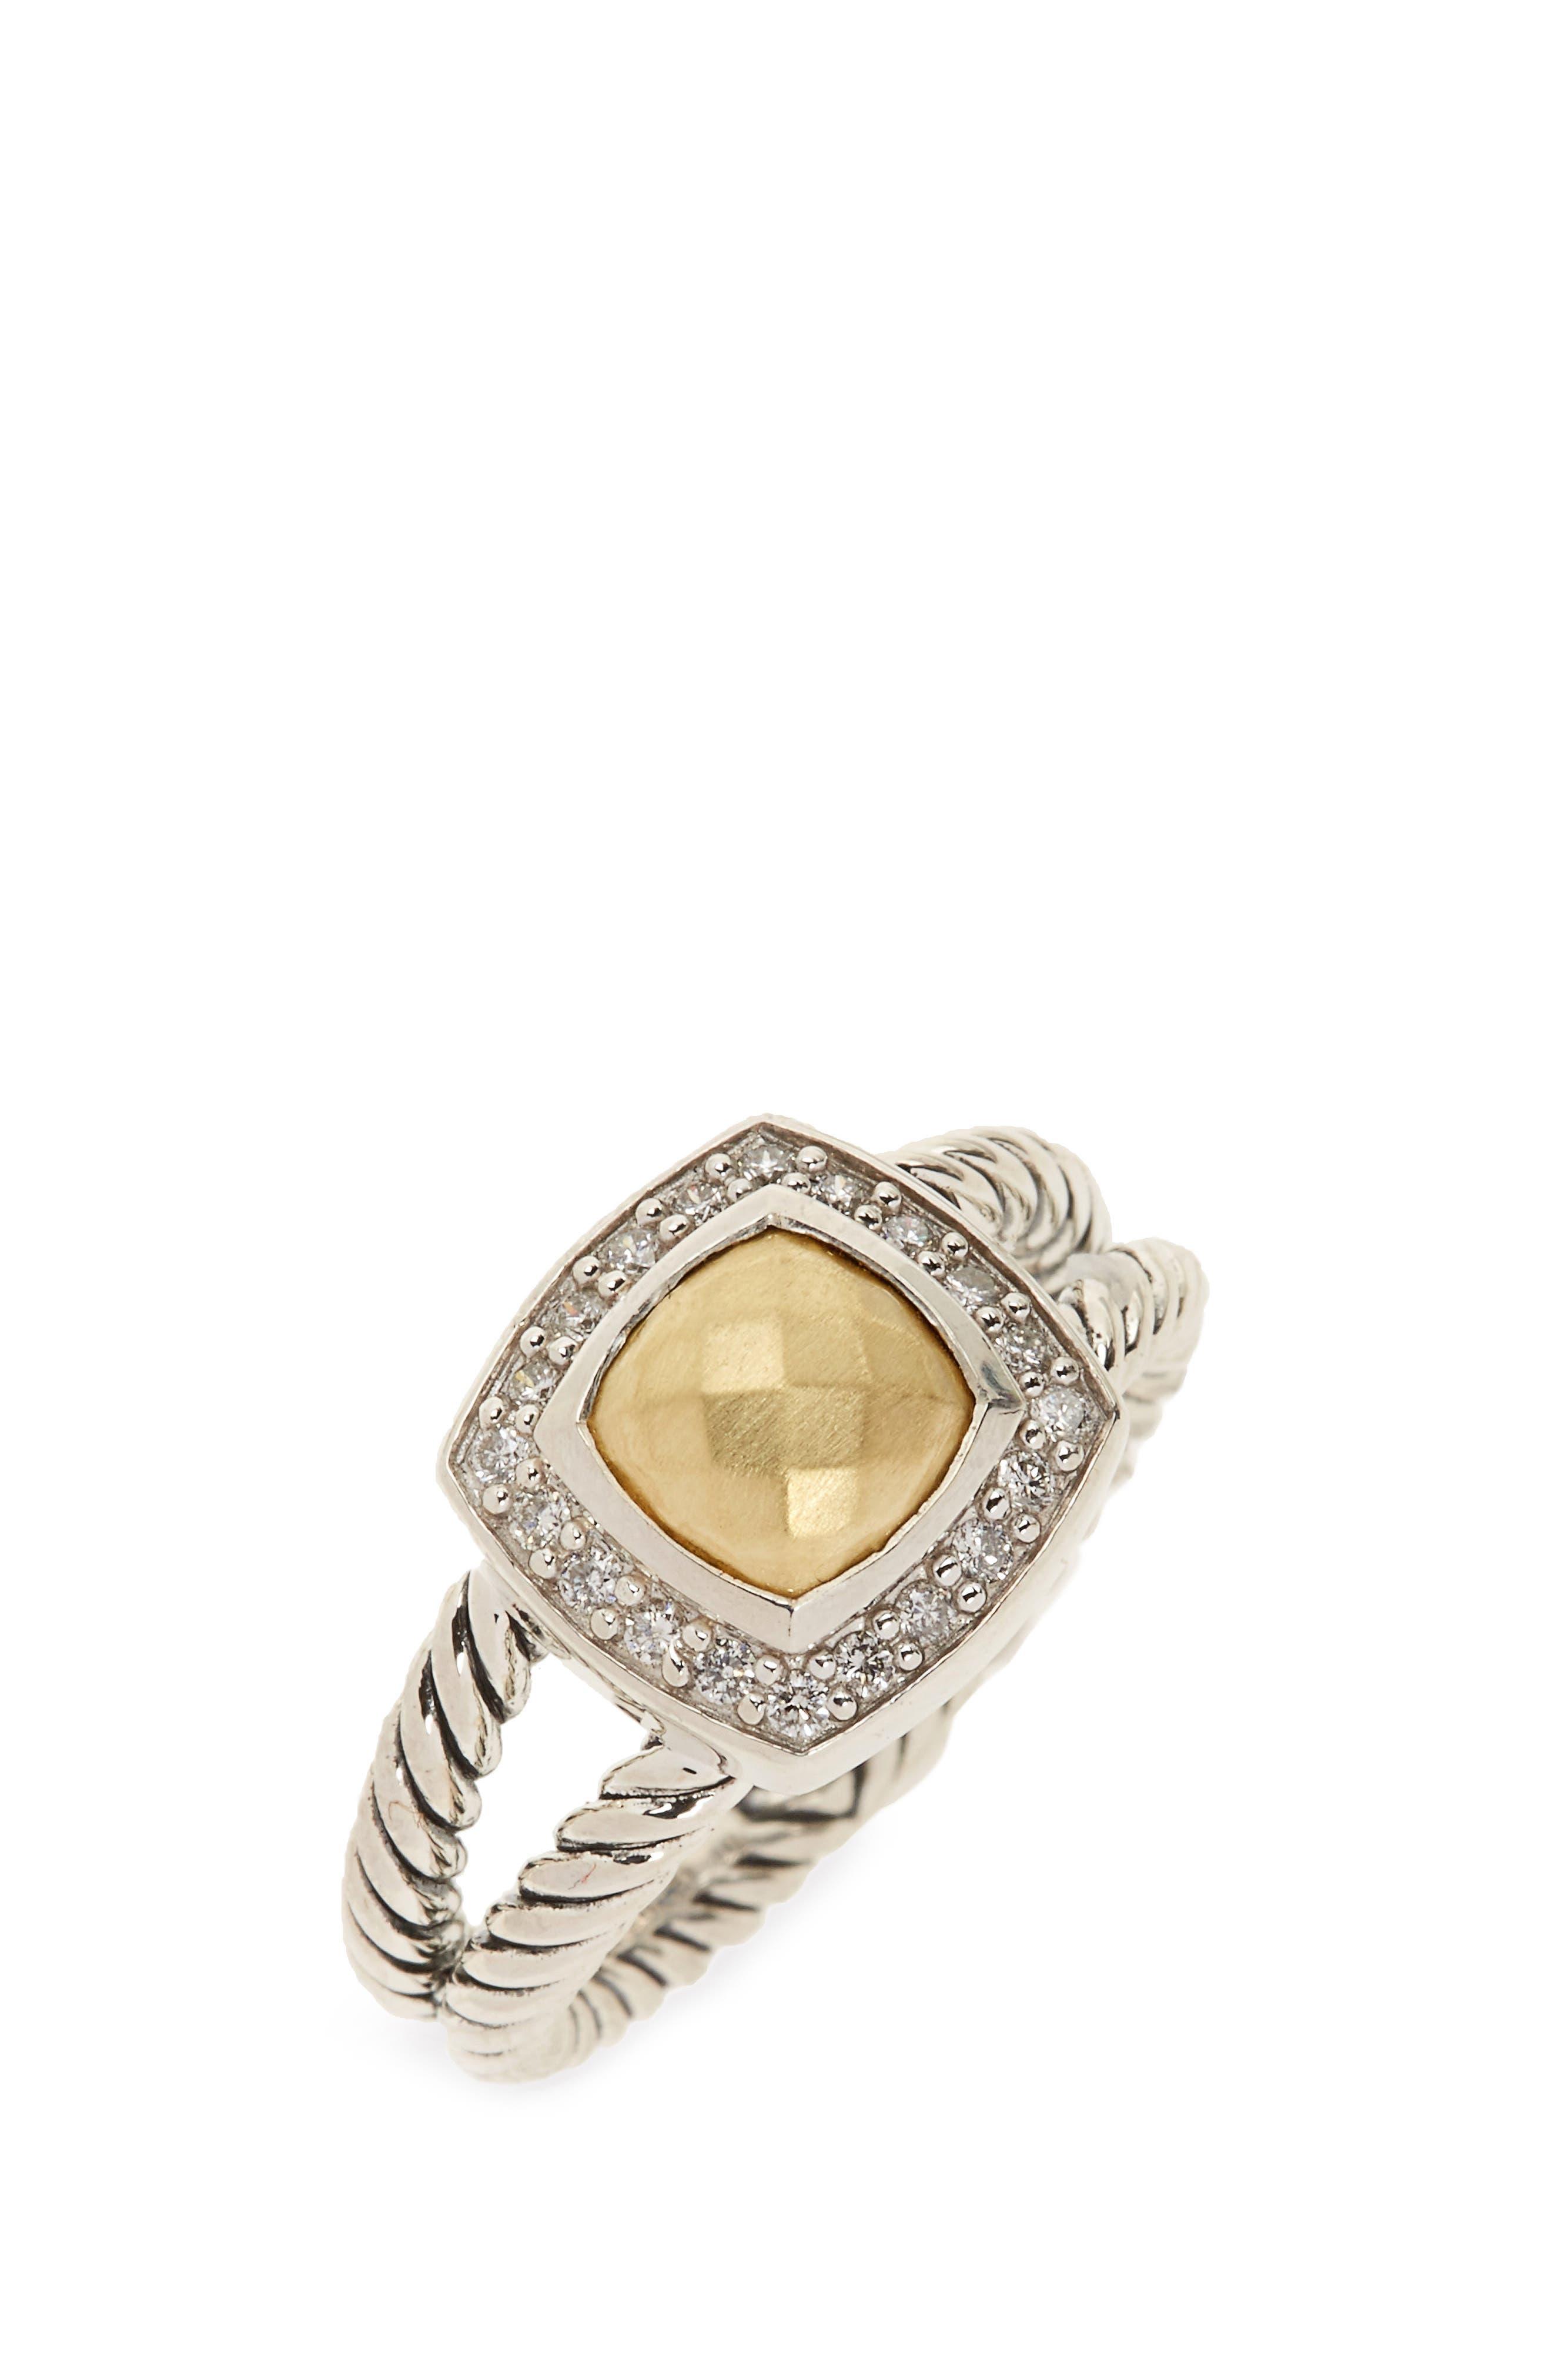 Petite Albion Ring with Semiprecious Stone & Diamonds,                         Main,                         color, Silver/ Gold